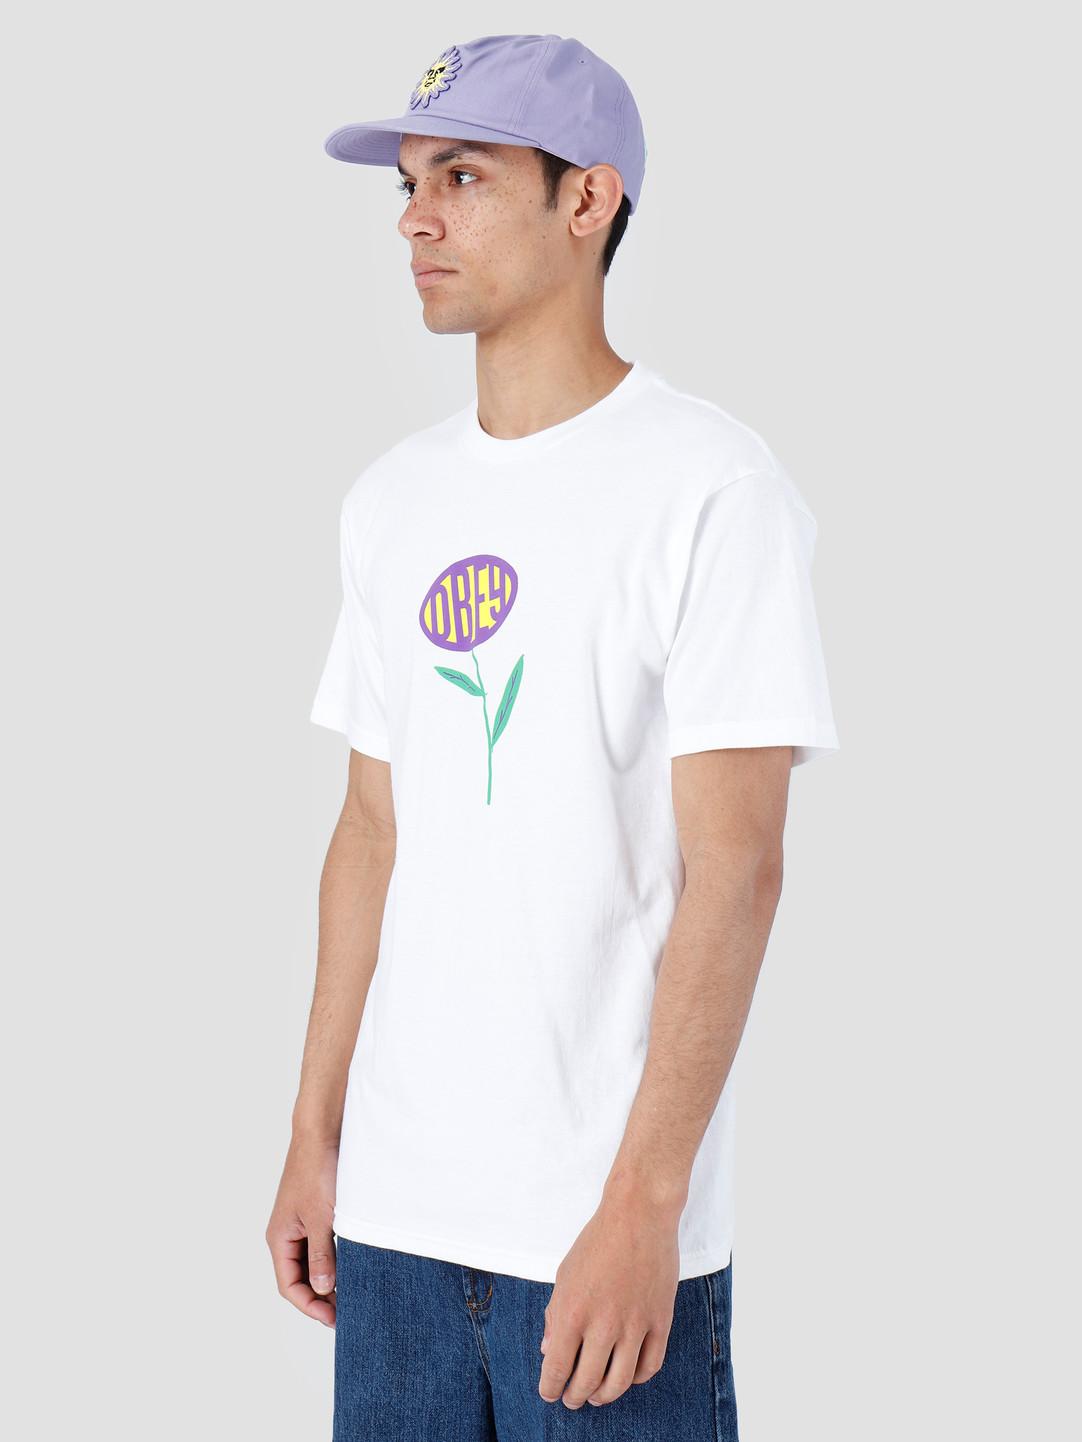 Obey Obey Lily Basic T-Shirt White 163081980-WHT